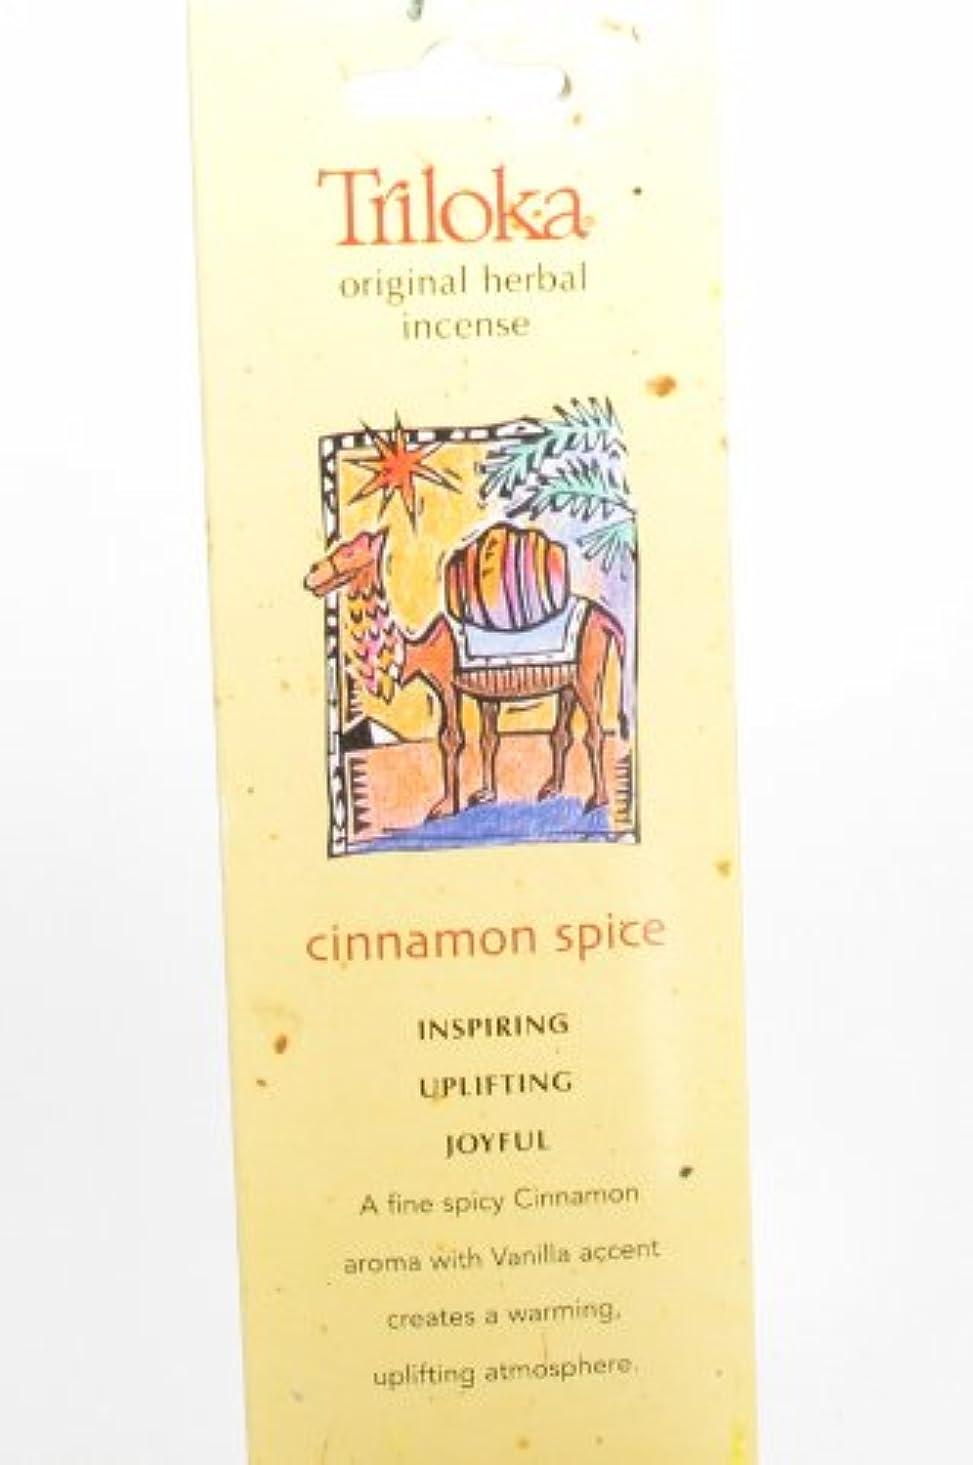 失態炭素再生可能Cinnamon Spice – Triloka元Herbal Incense Sticks